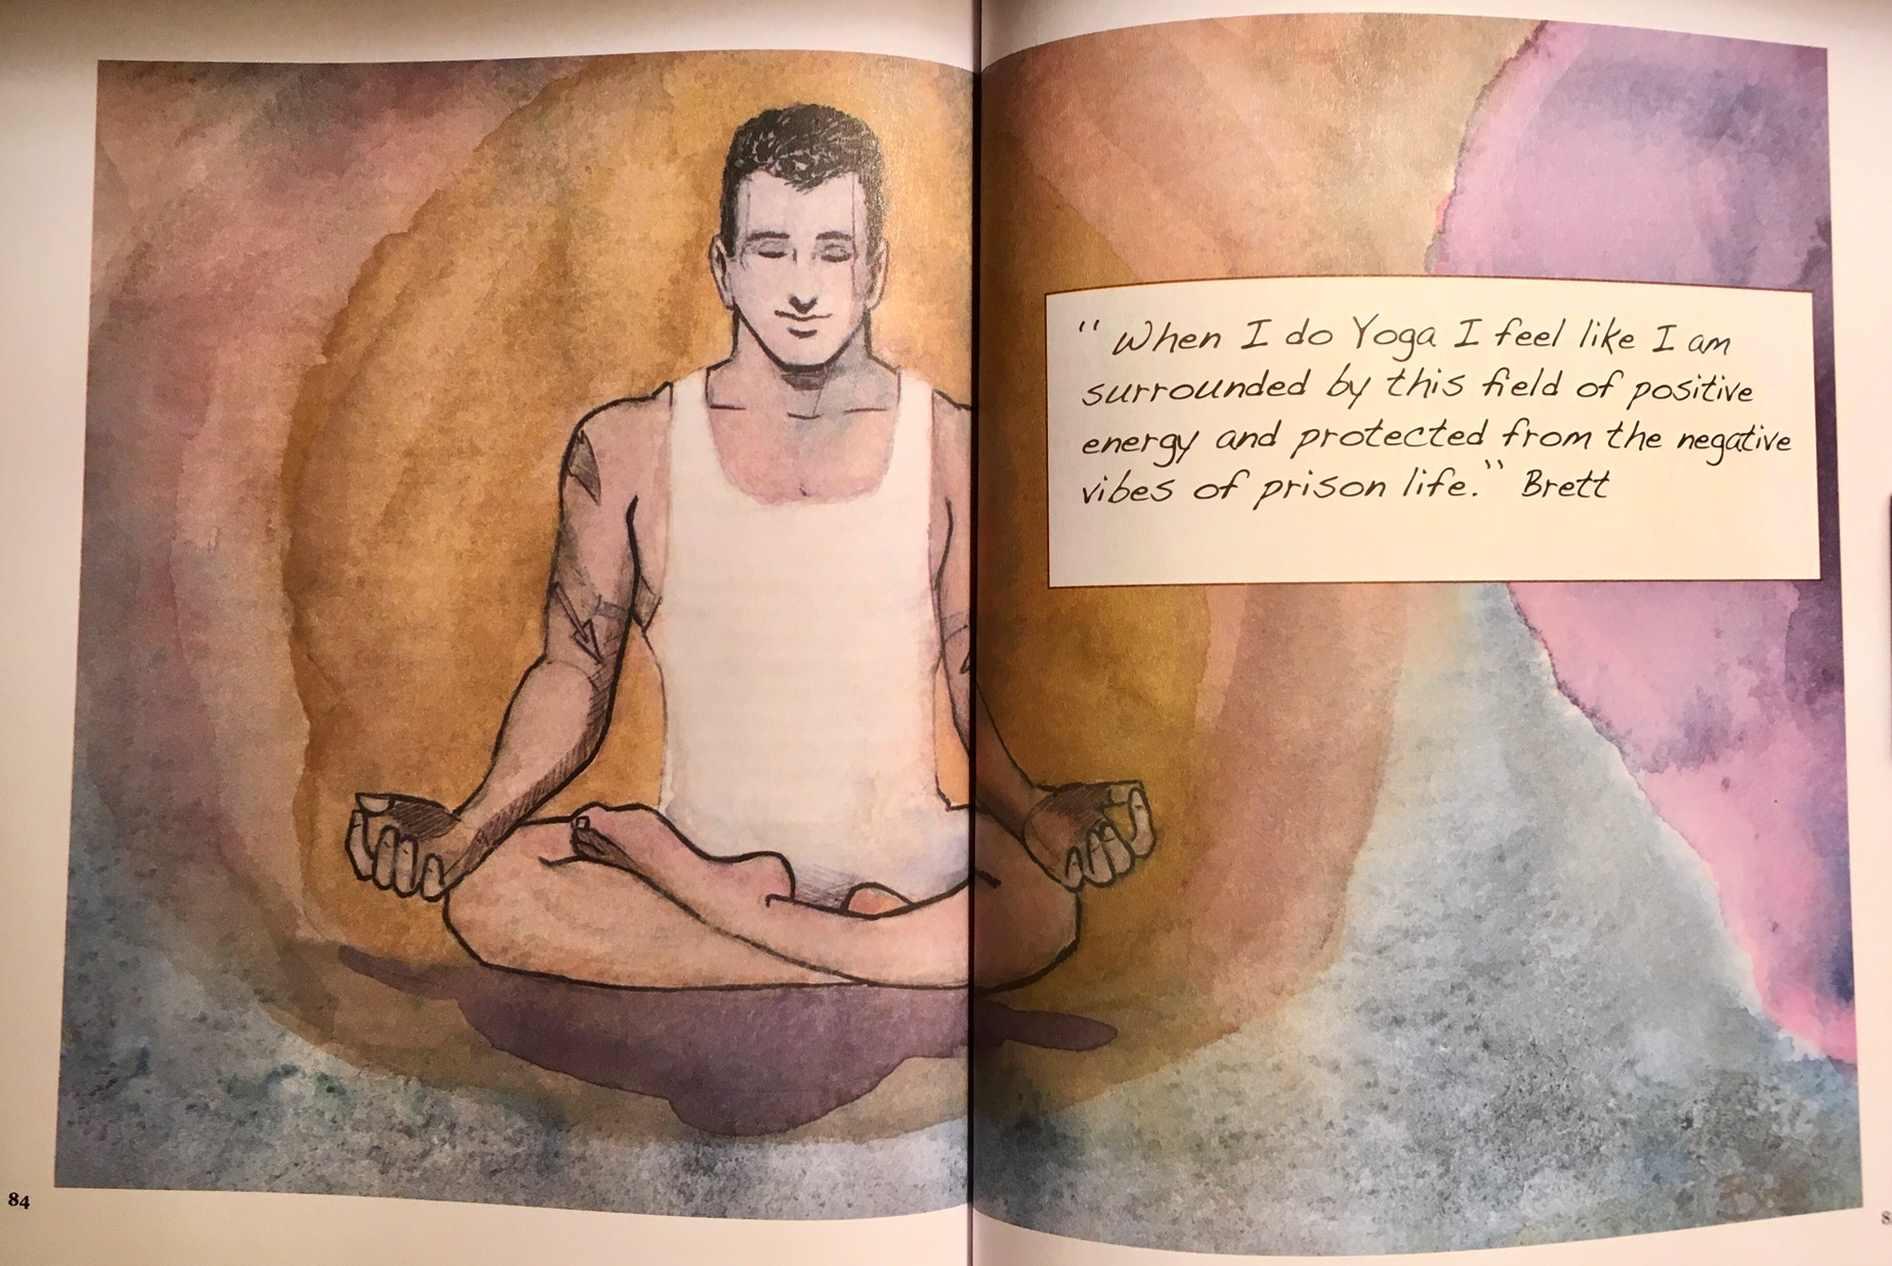 Yoga Artwork by Brett -IMG_8046 - Copy.jpg